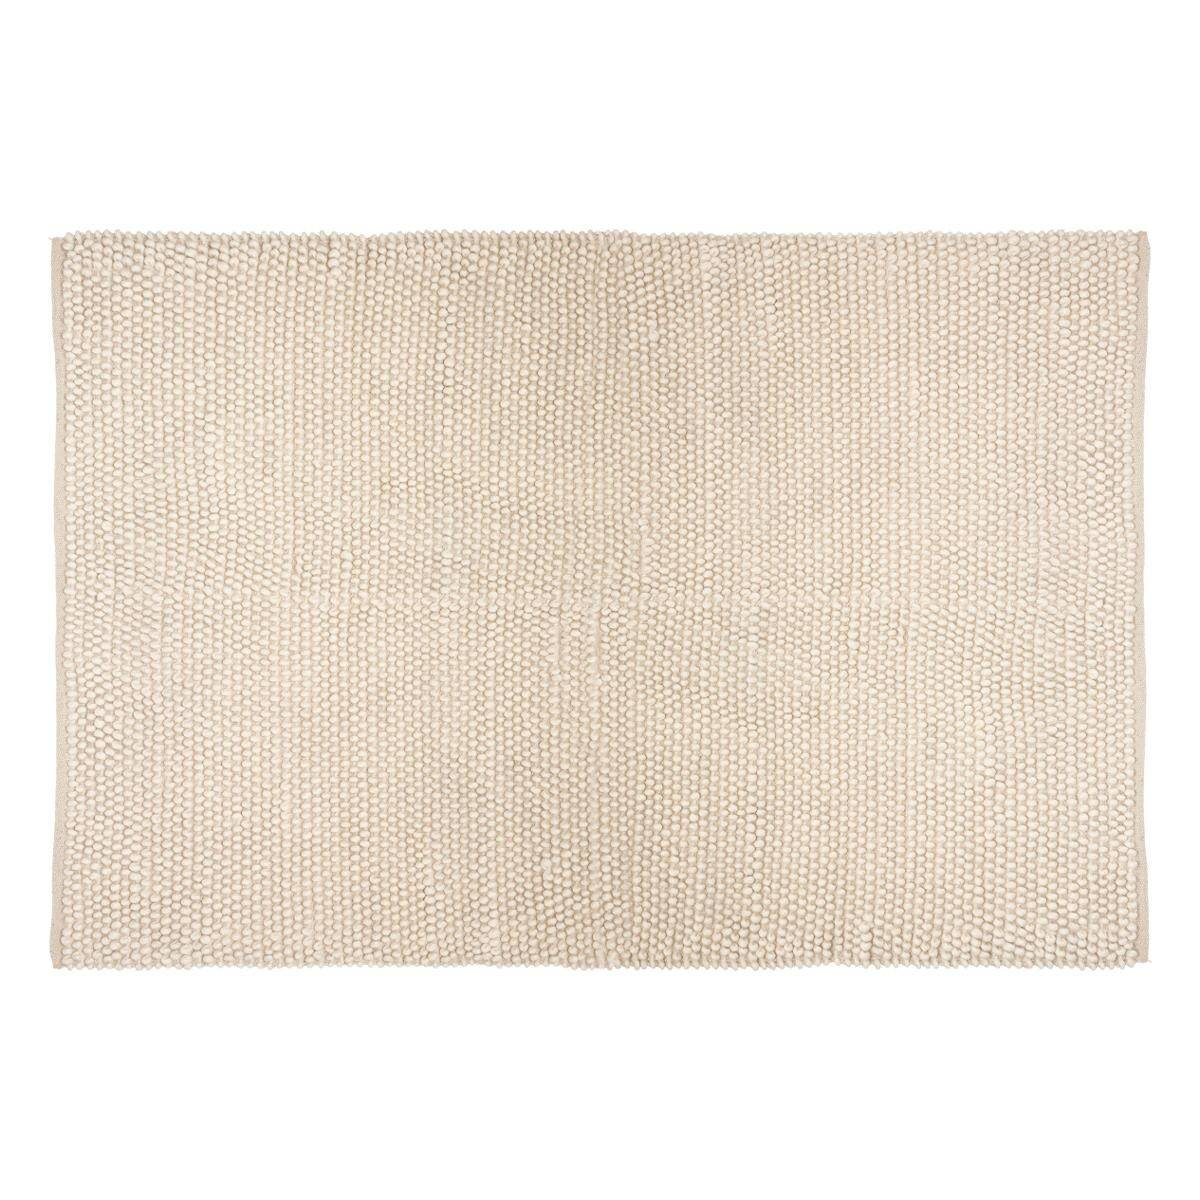 "Atmosphera Tapis ""Mix"", laine coton, ivoire 120x170 cm"